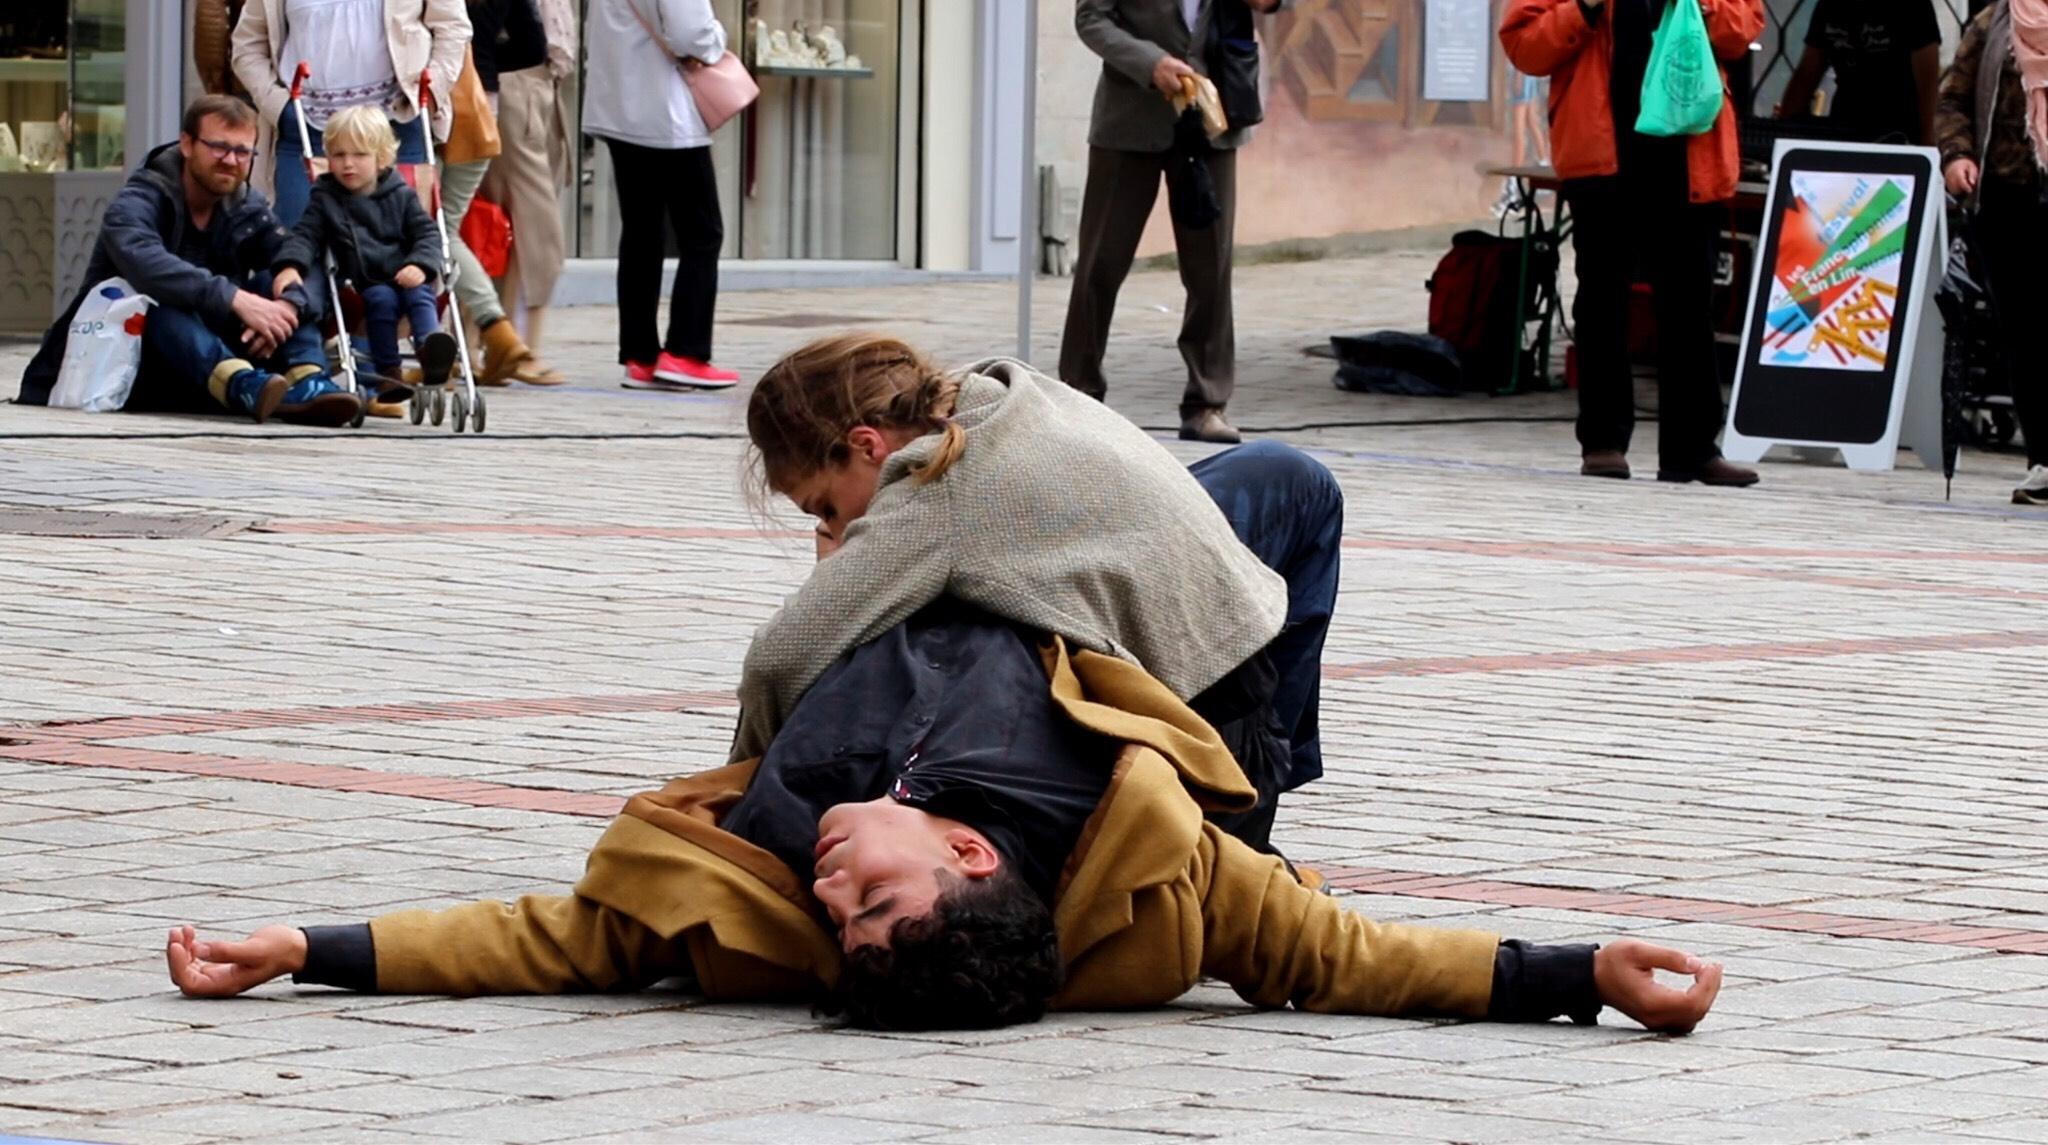 http://www.danzaurbana.eu/associazione/wp-content/uploads/2018/05/FOTO_BFAM_2.jpg